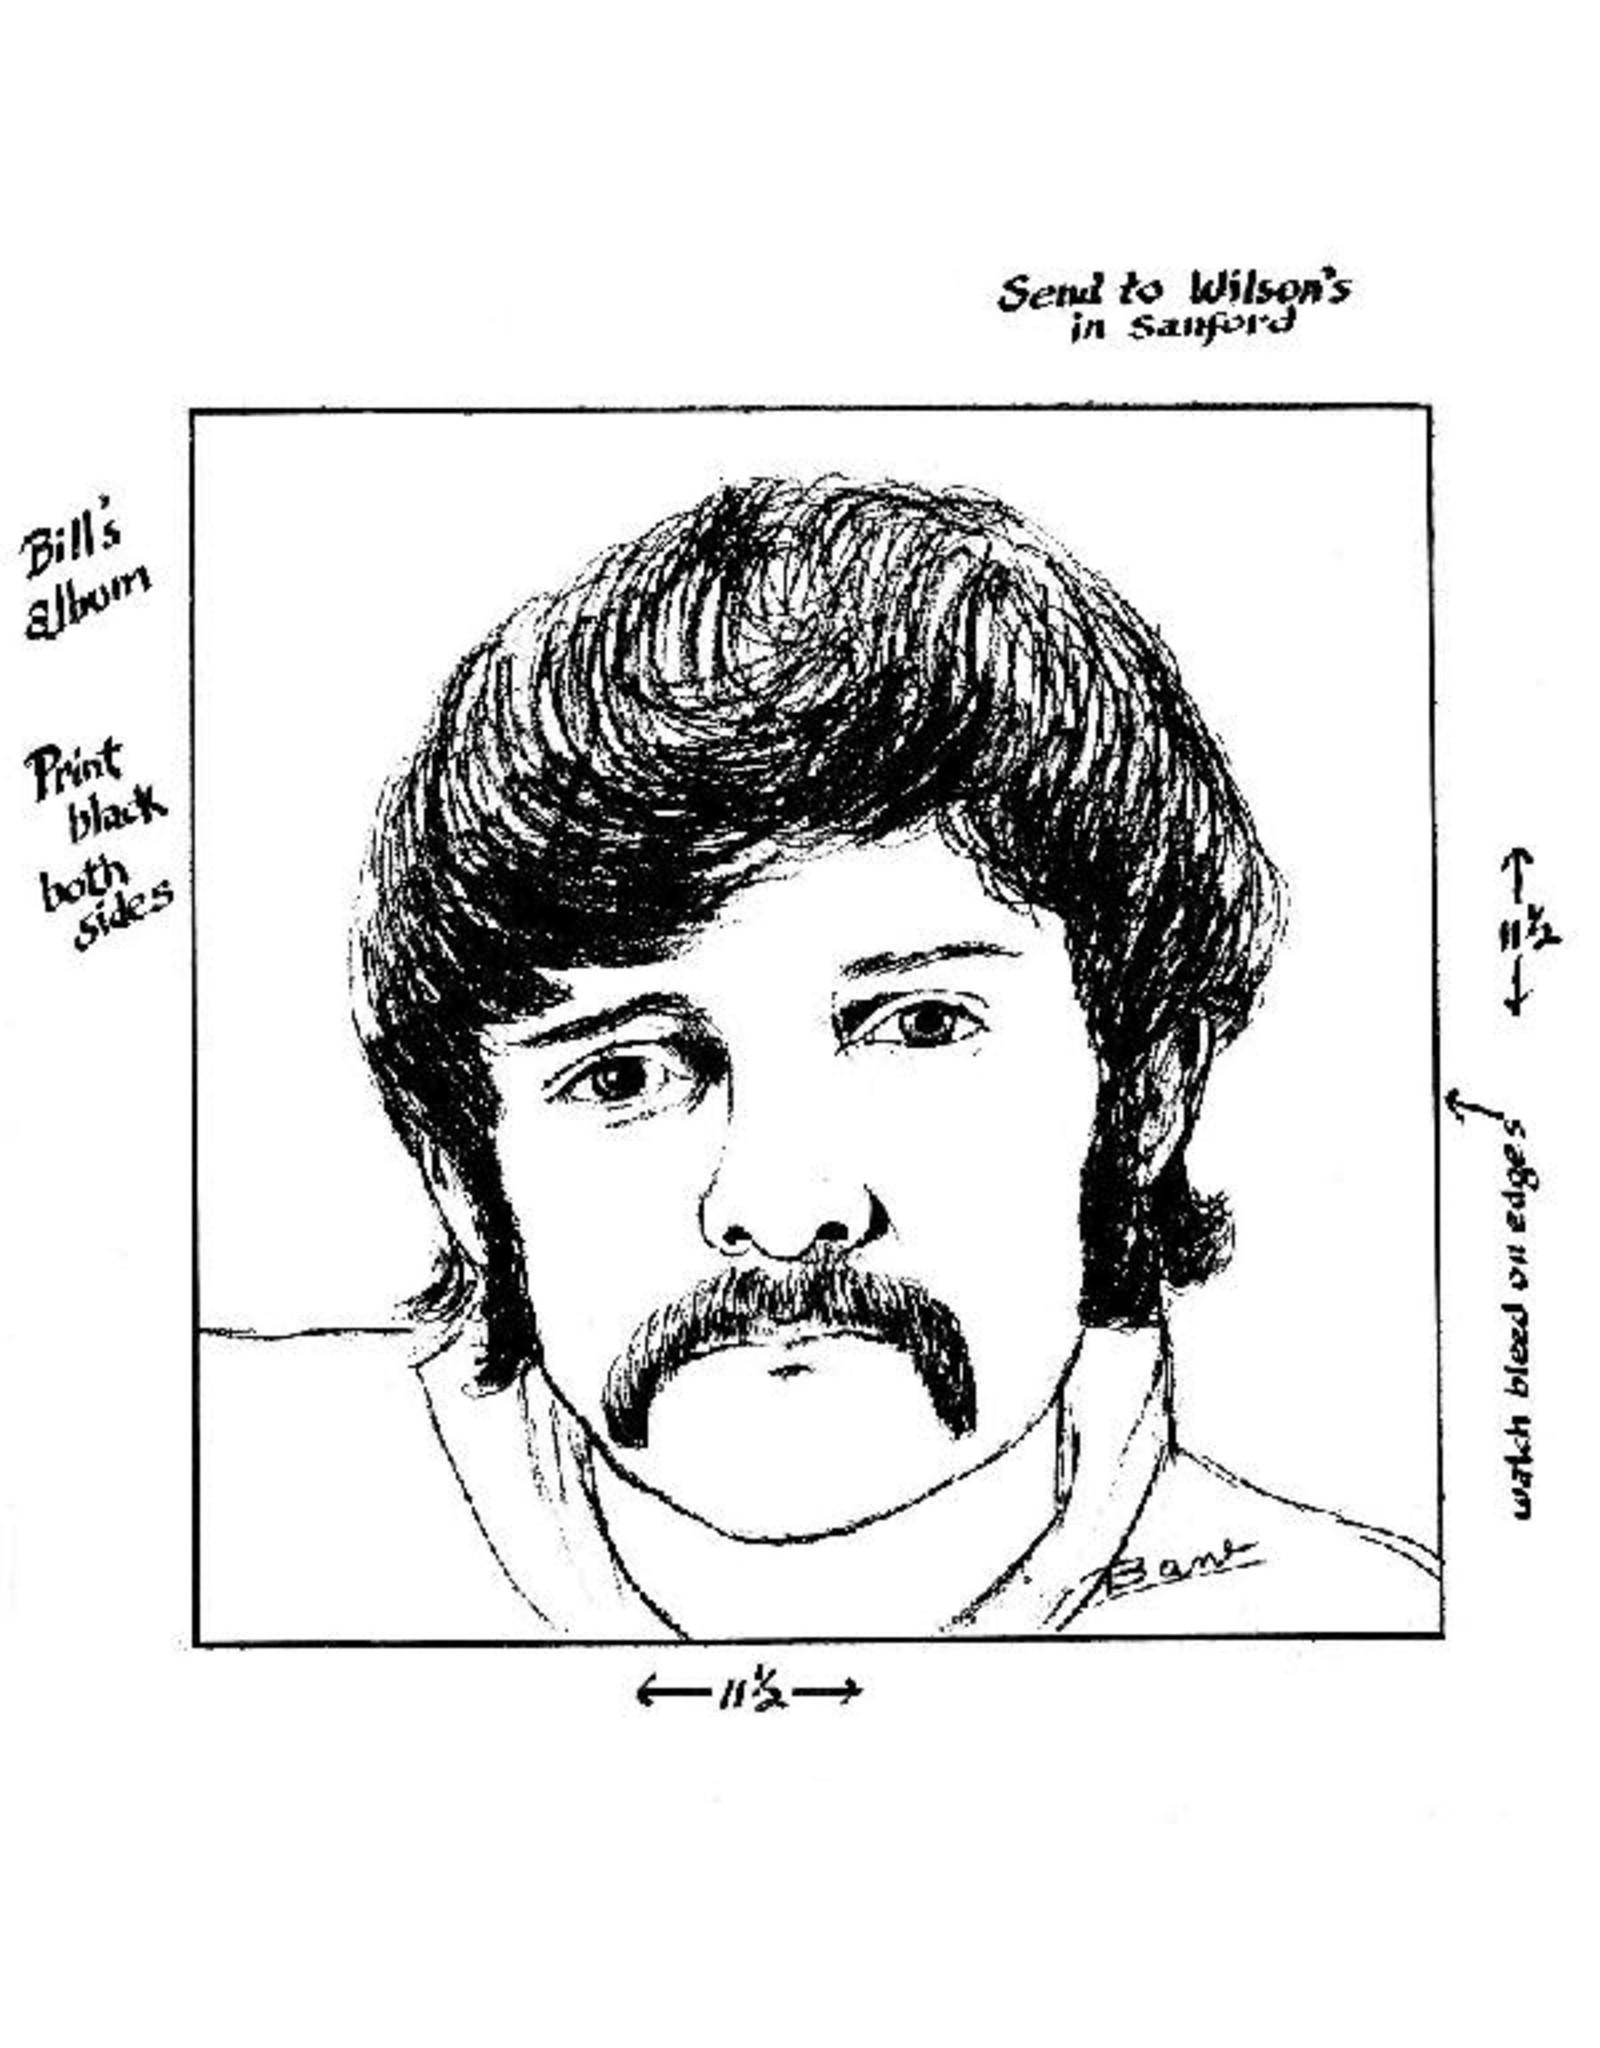 New Vinyl Bill Stone - Stone LP